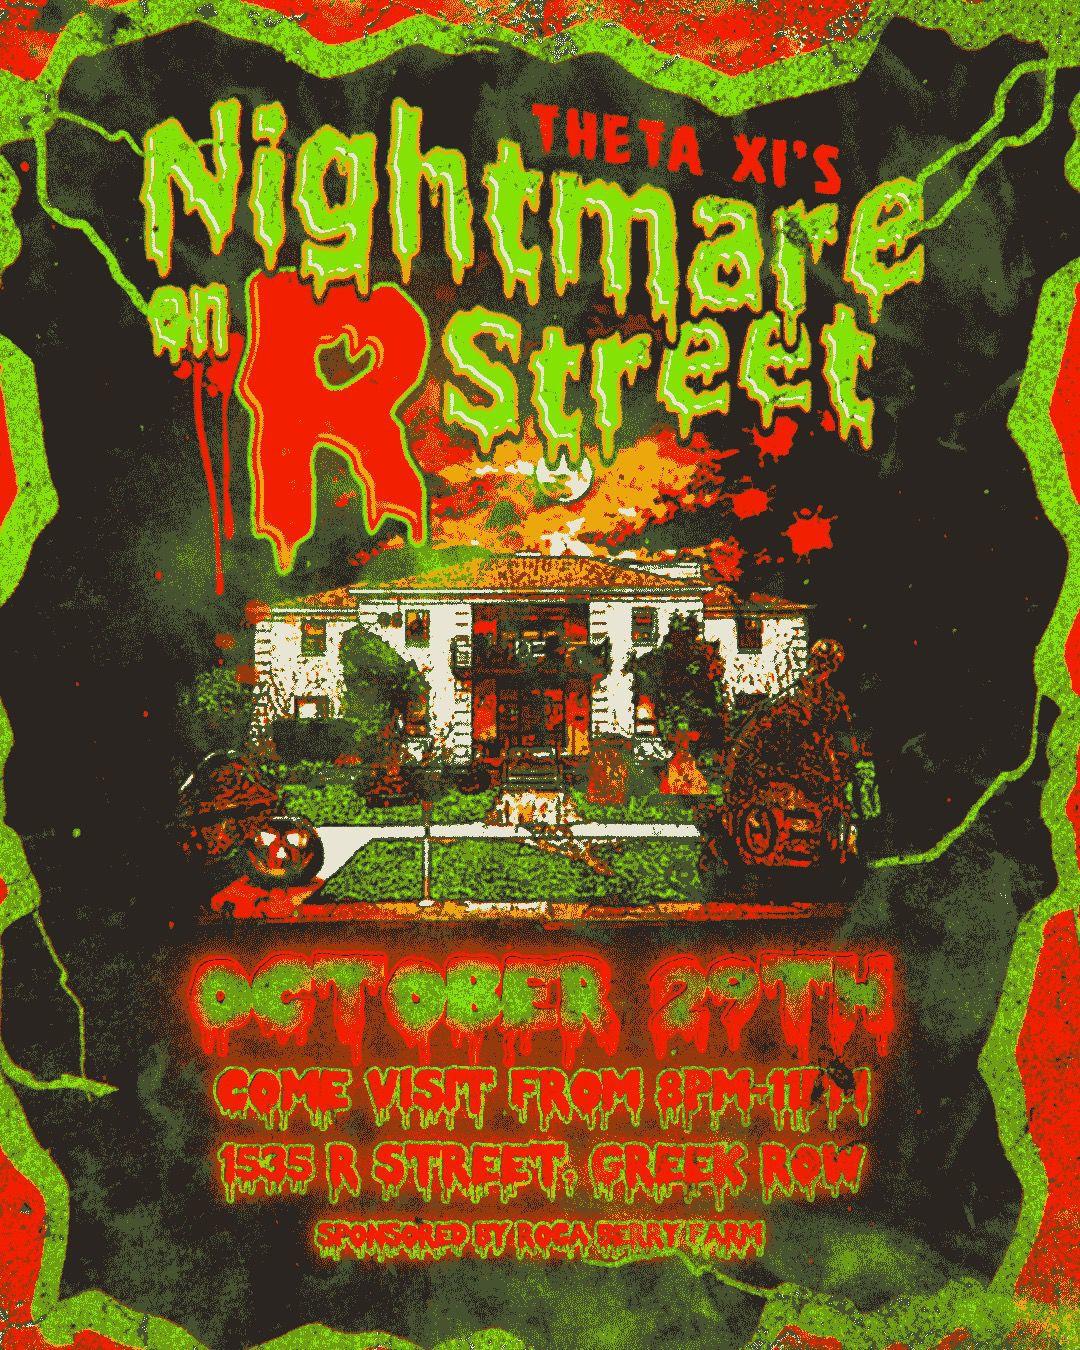 Nightmare on R Street